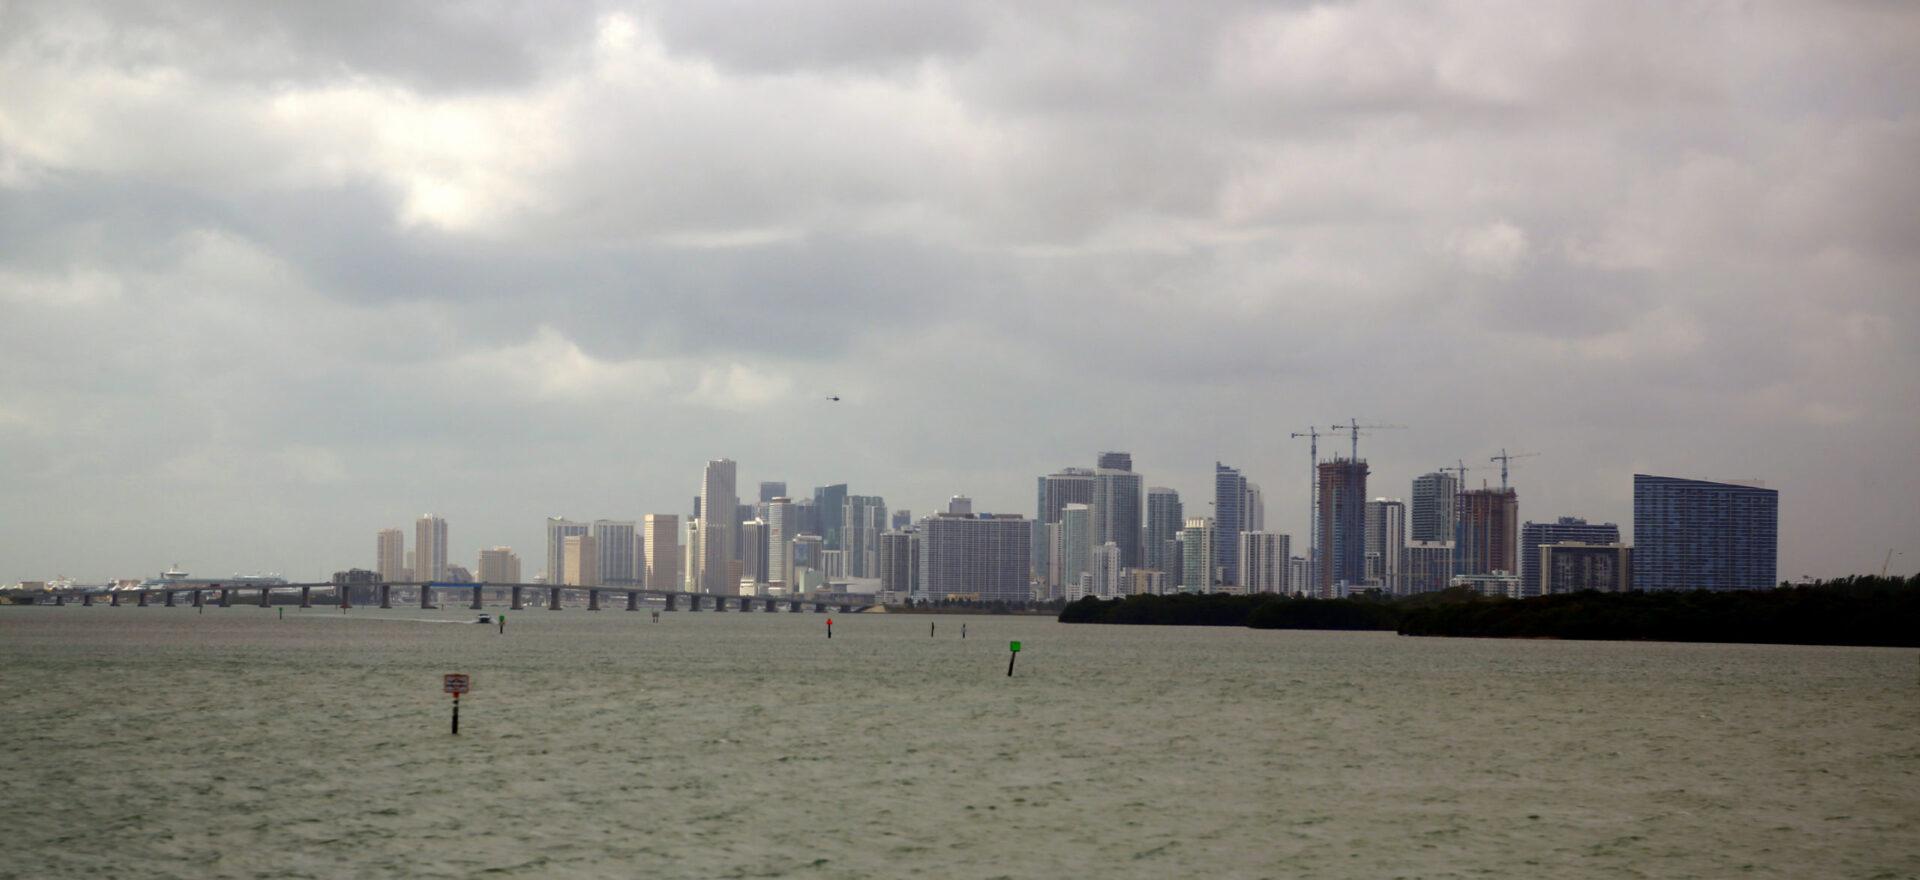 Майами. Фенита лякомедиа